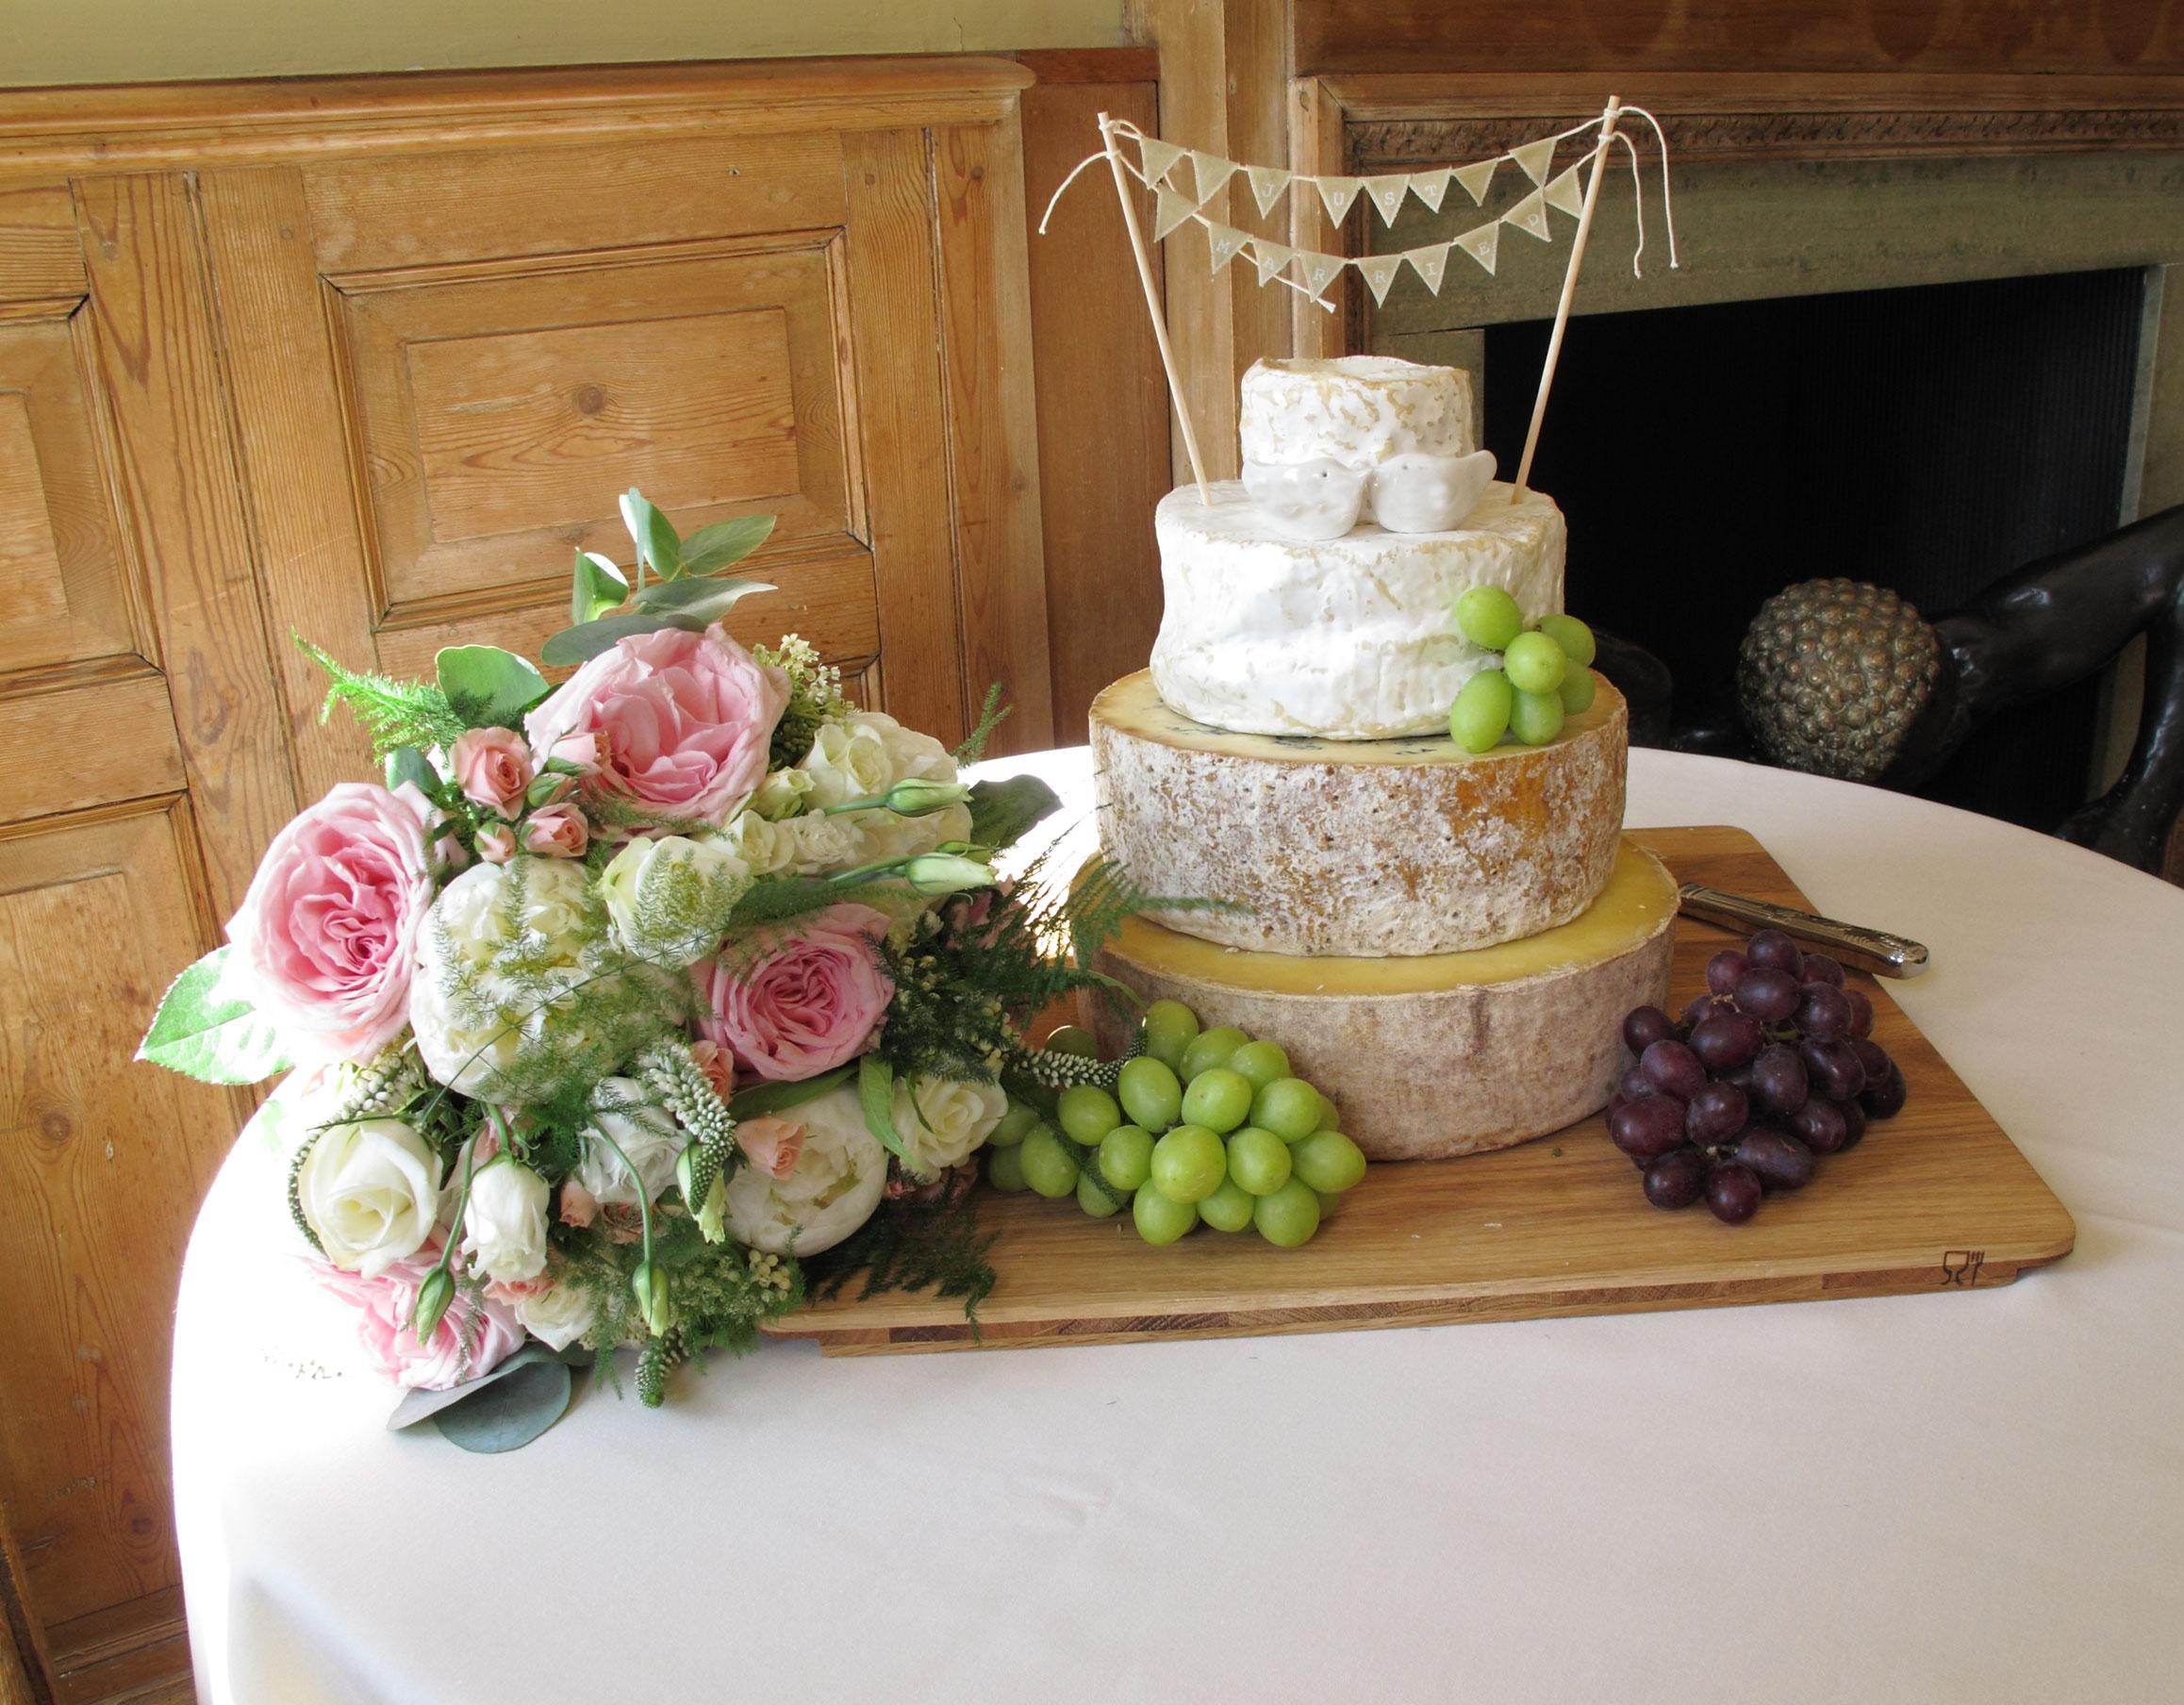 La mesa de quesos un must para las bodas - Mesa de quesos para bodas ...